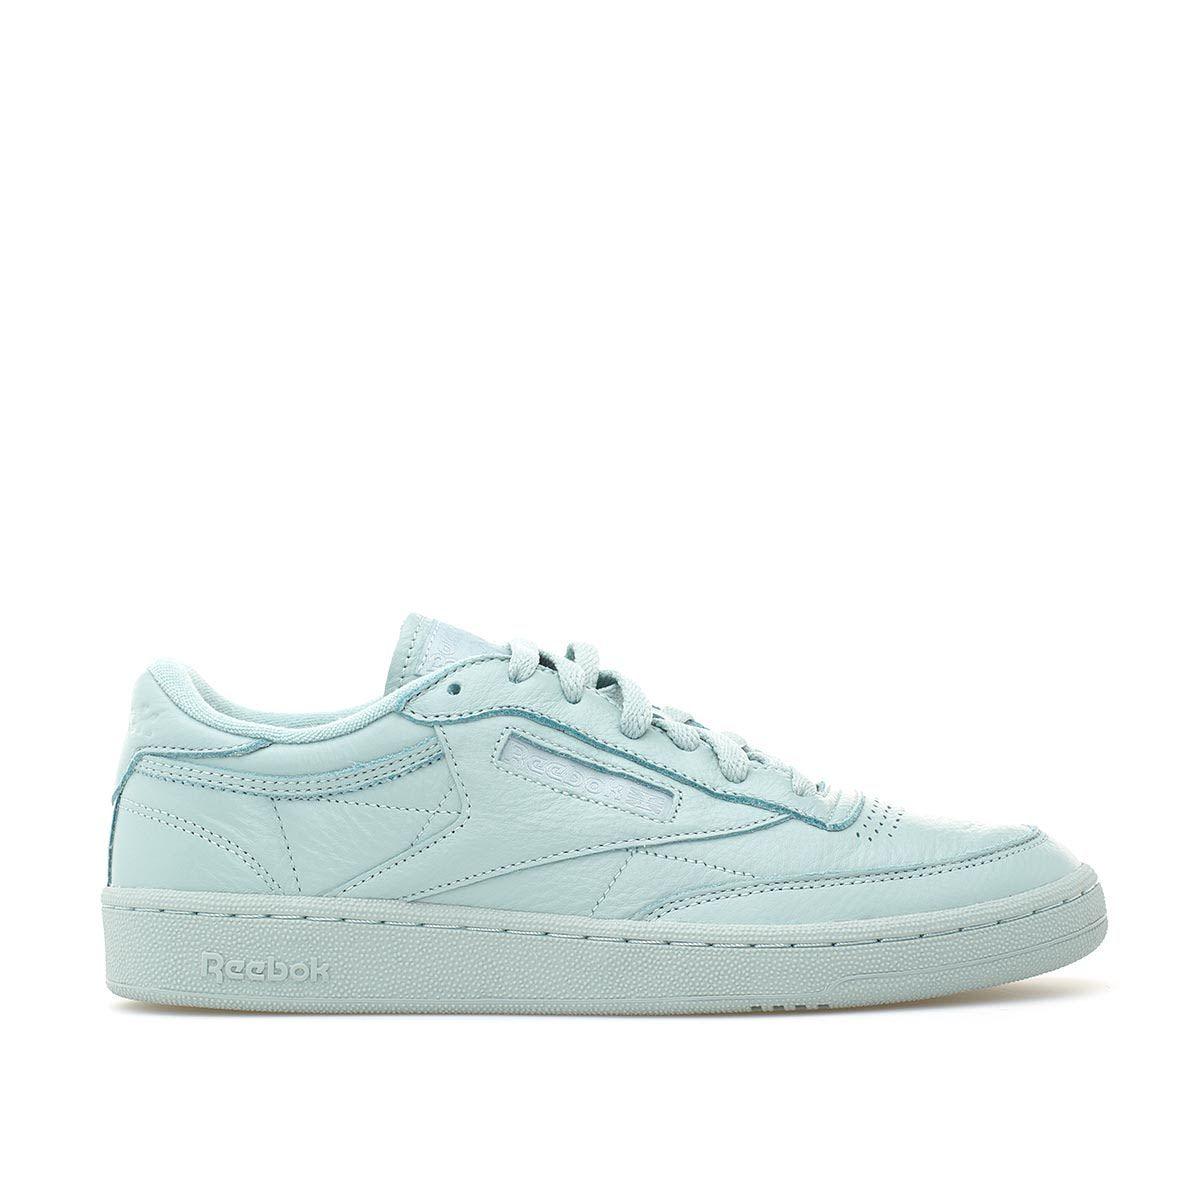 38cb78d66299 REEBOK CLUB C 85 ELM.  reebok  shoes